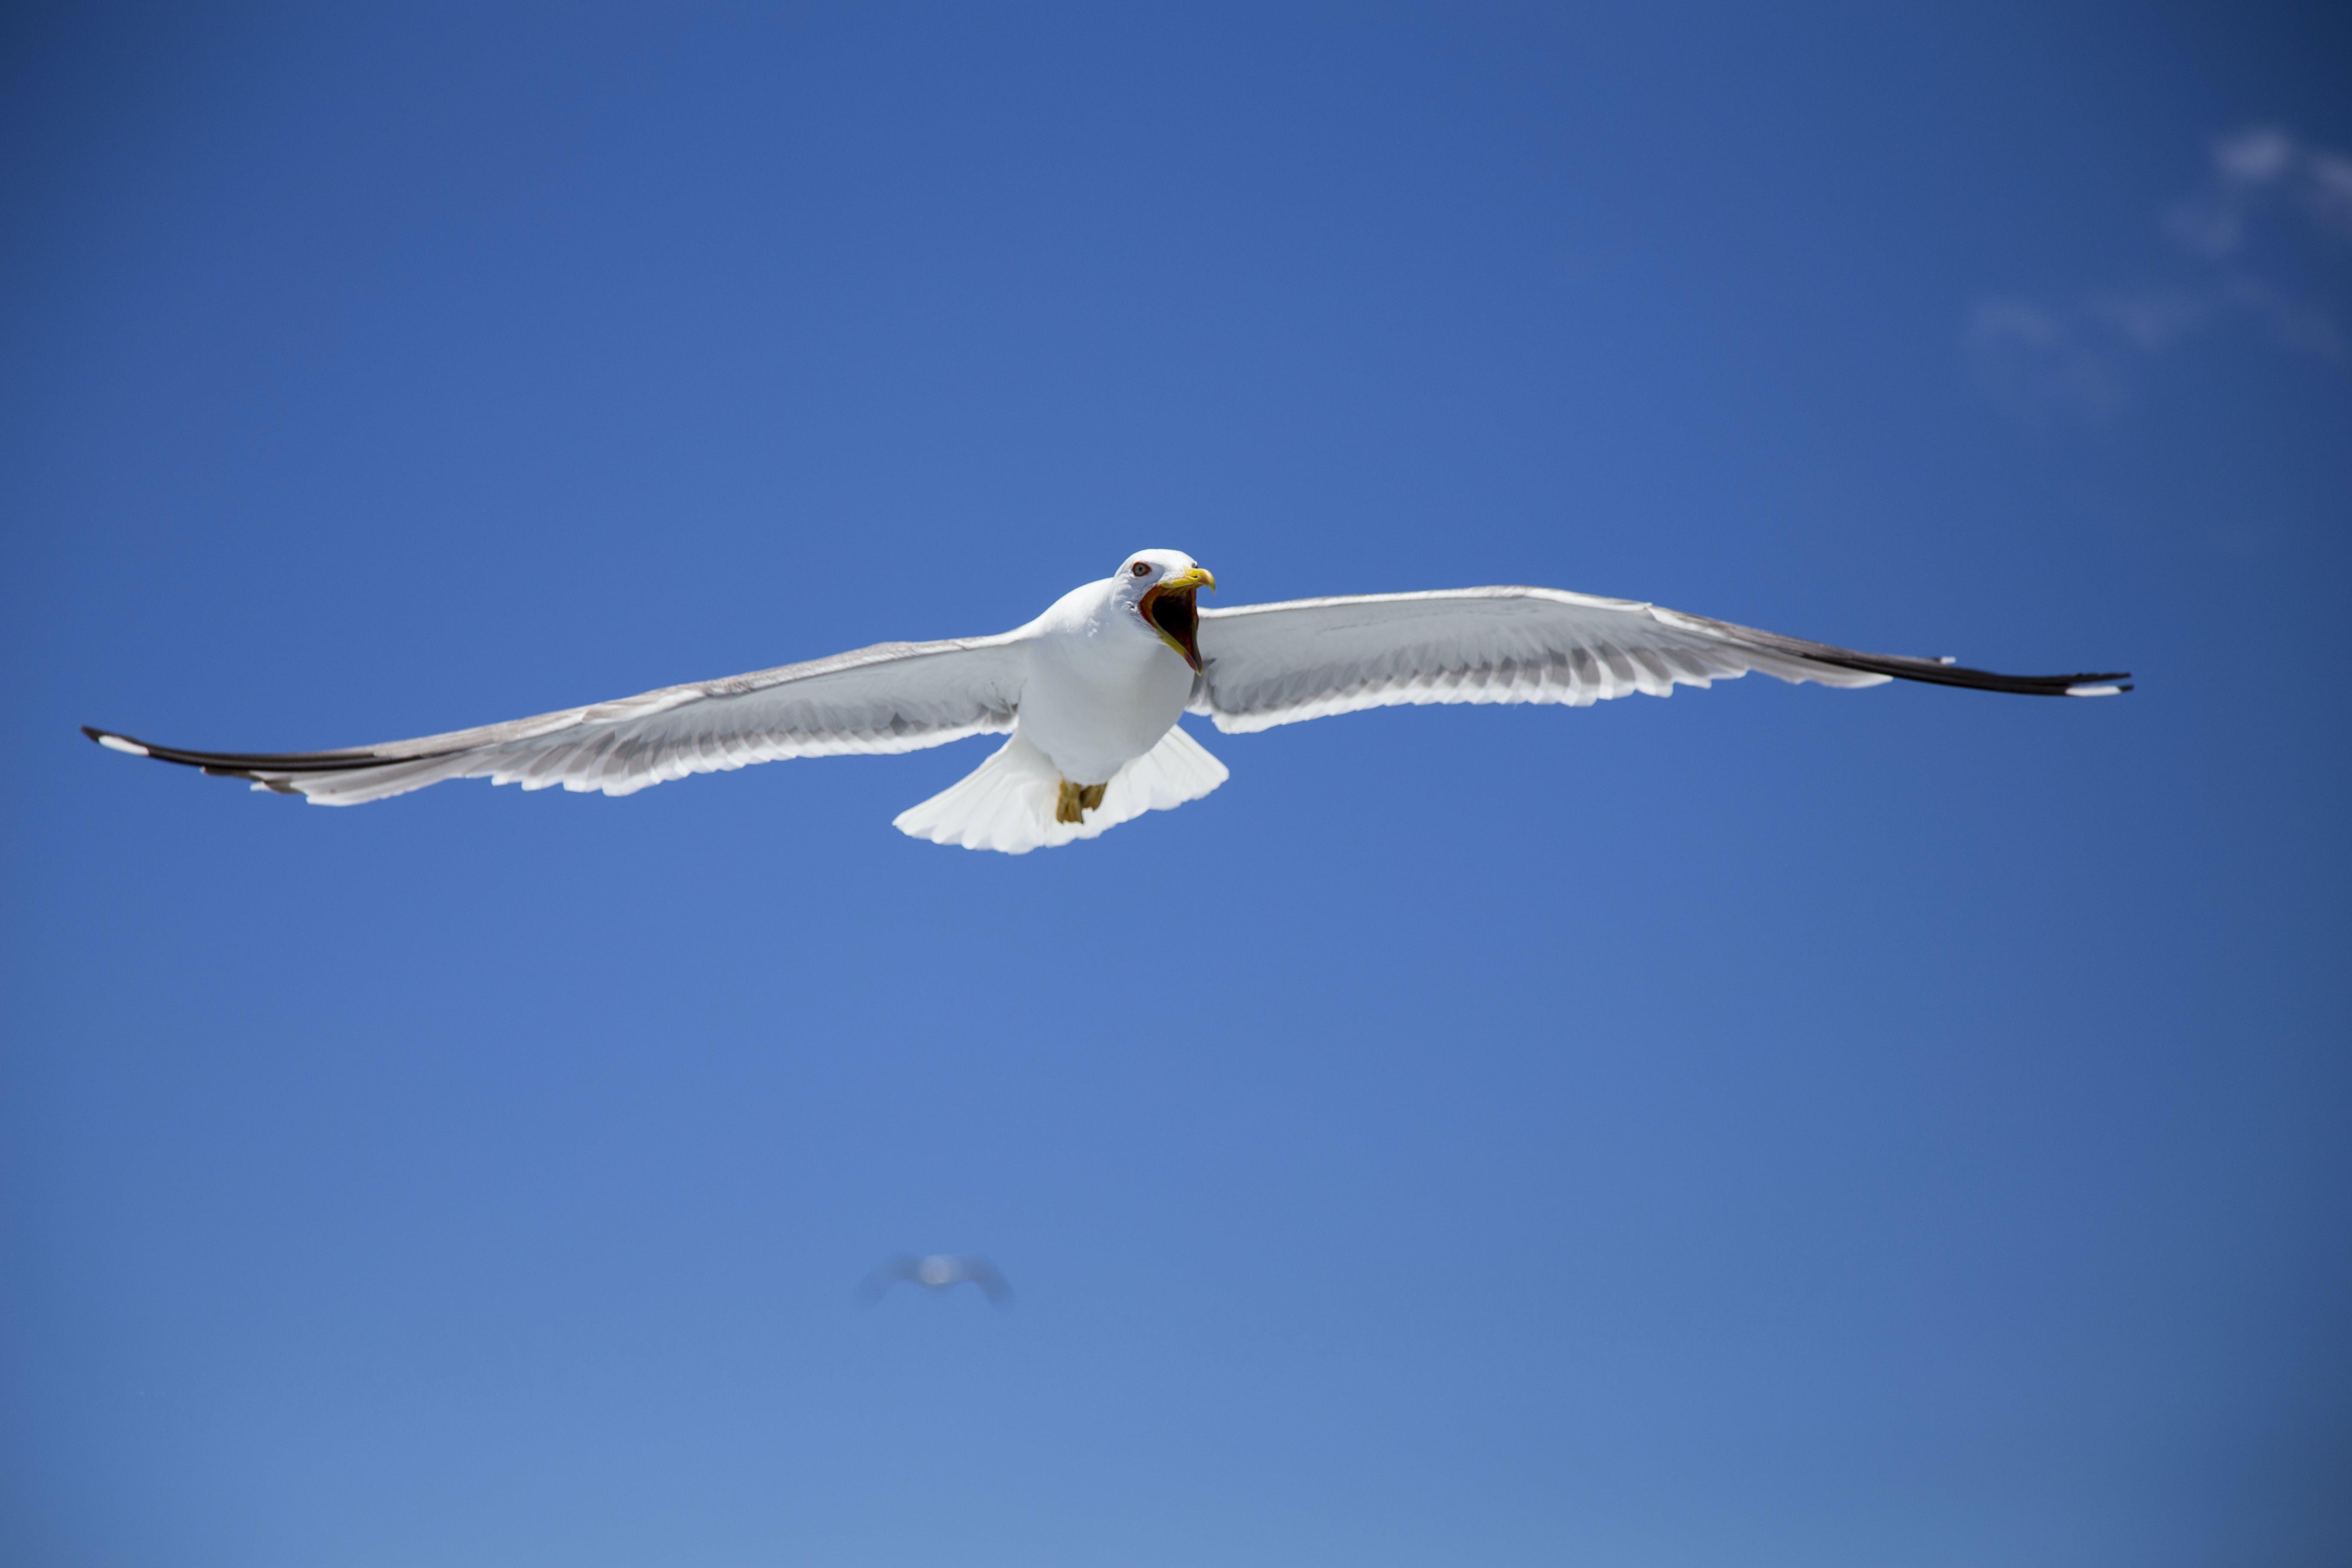 Free stock photo of bird, blue, blue sky, flying